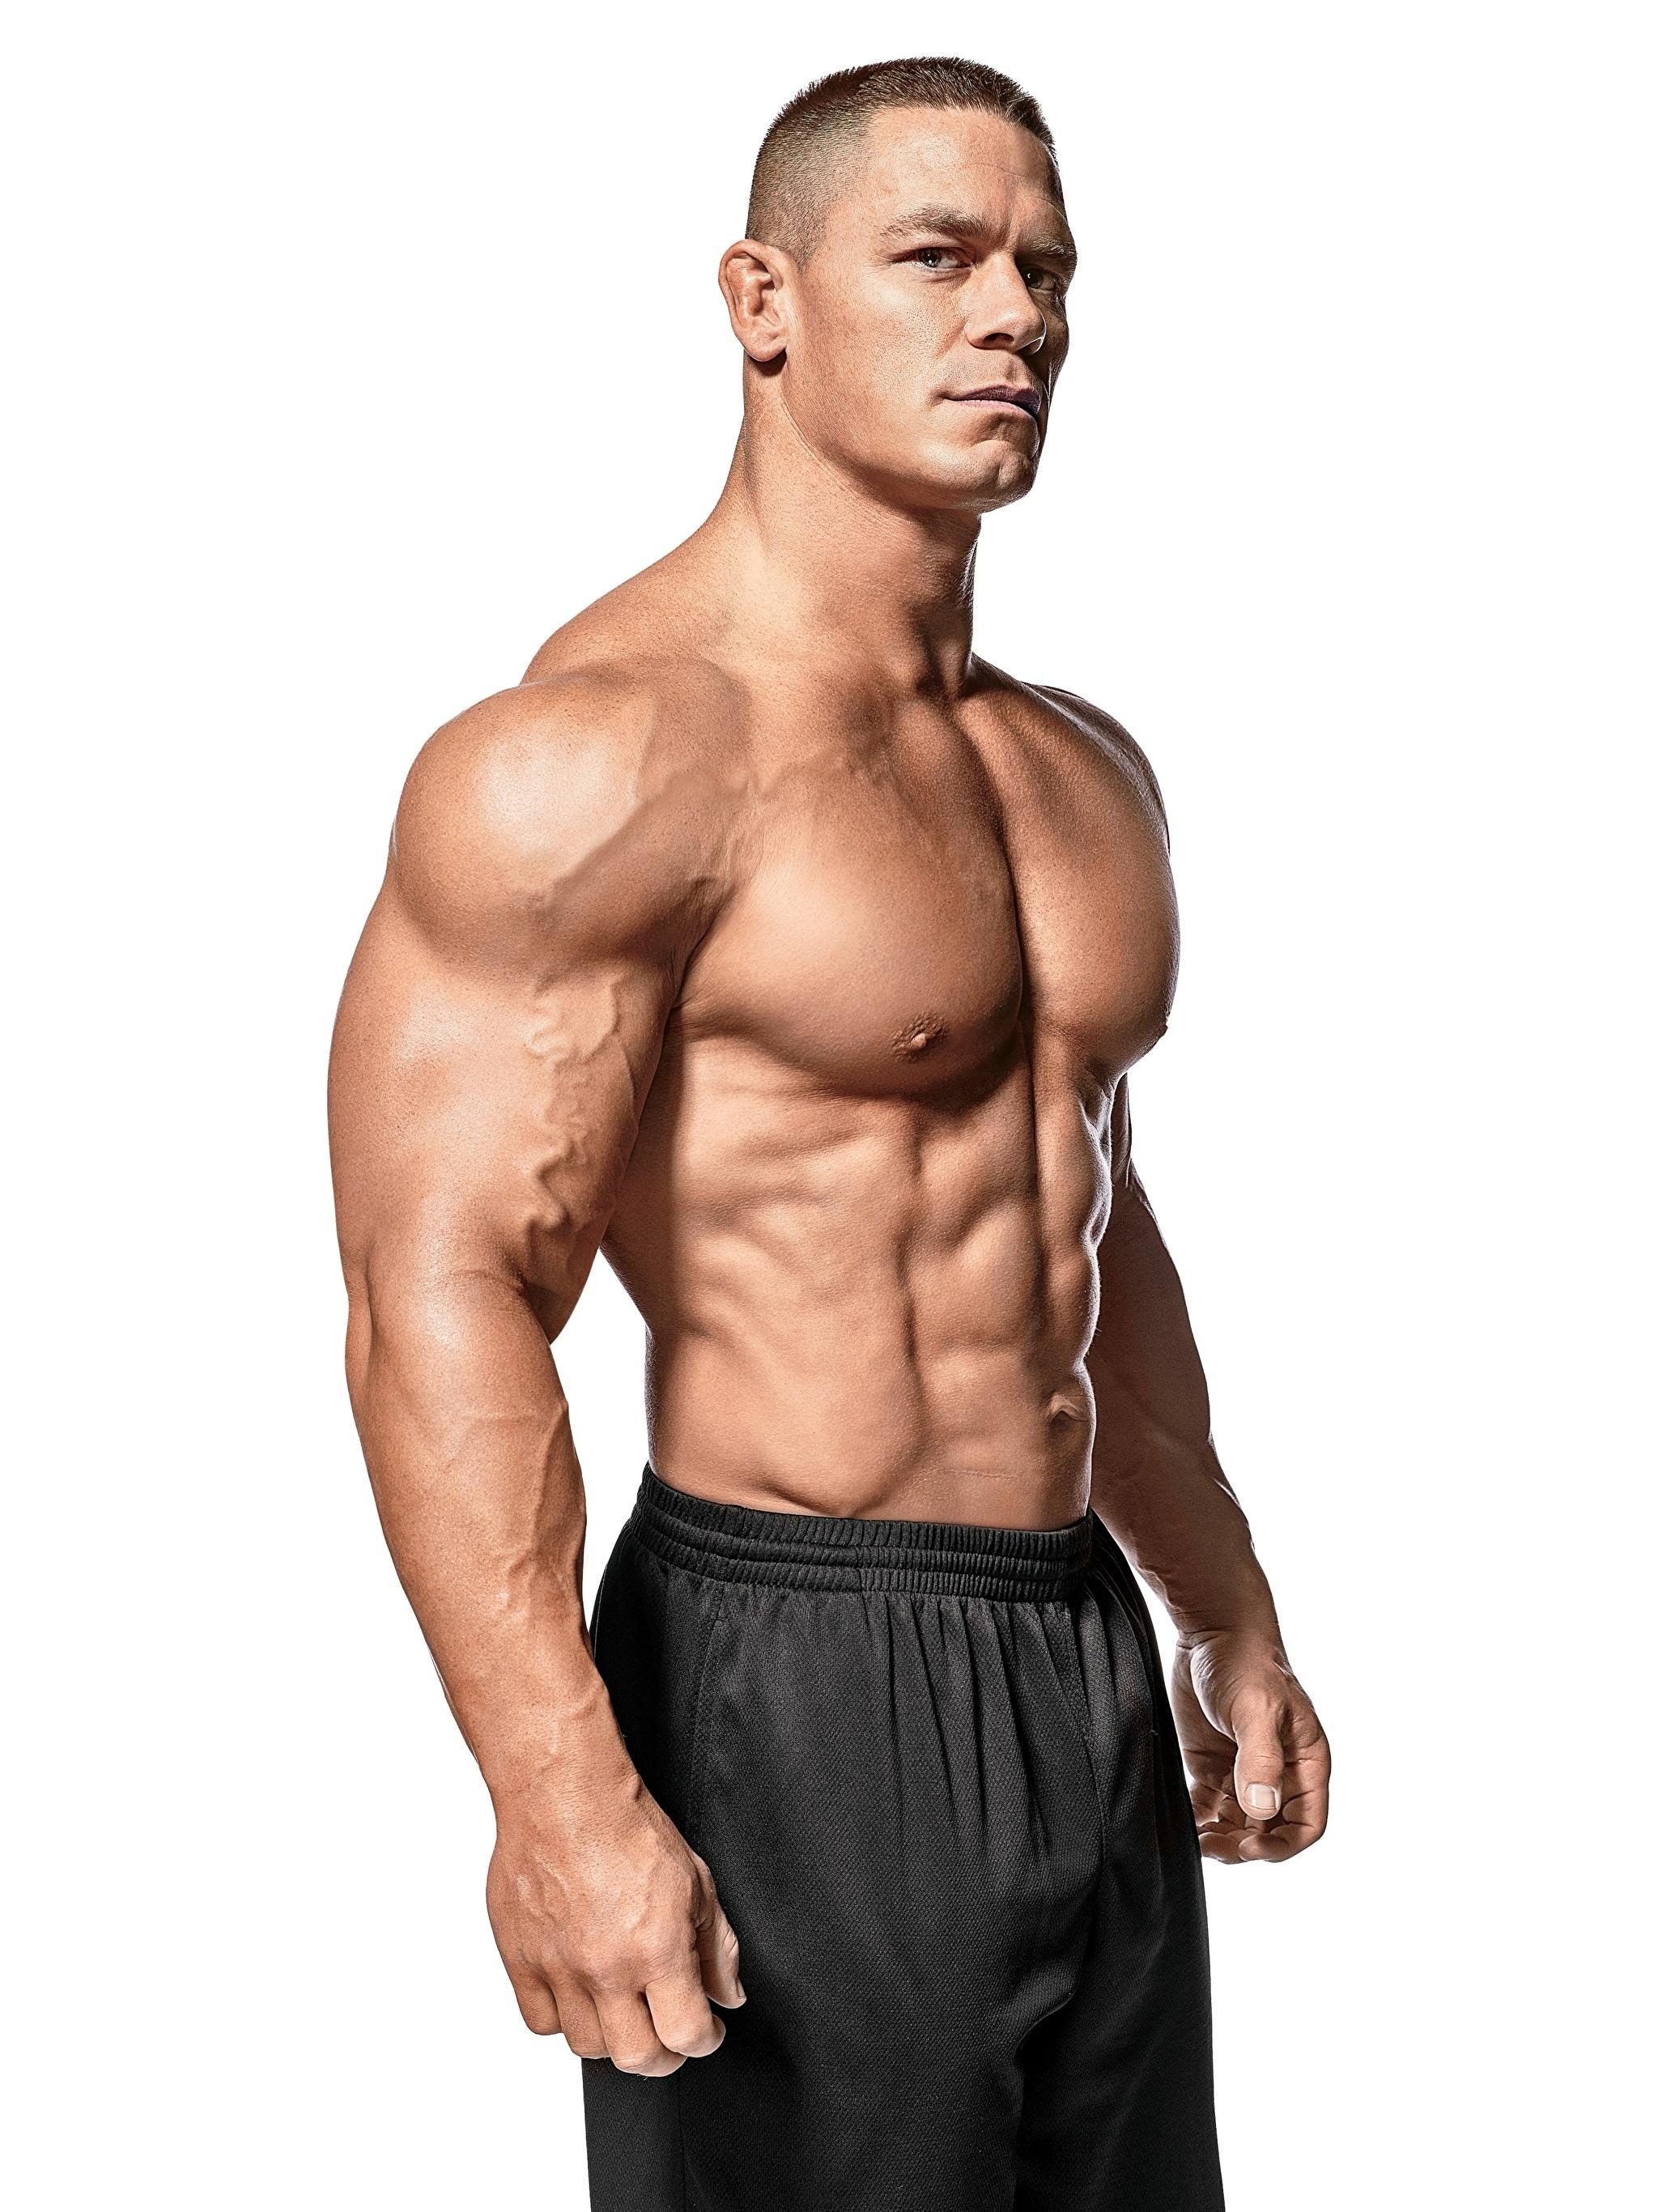 pictures men john cena bodybuilding white background 2048x2732